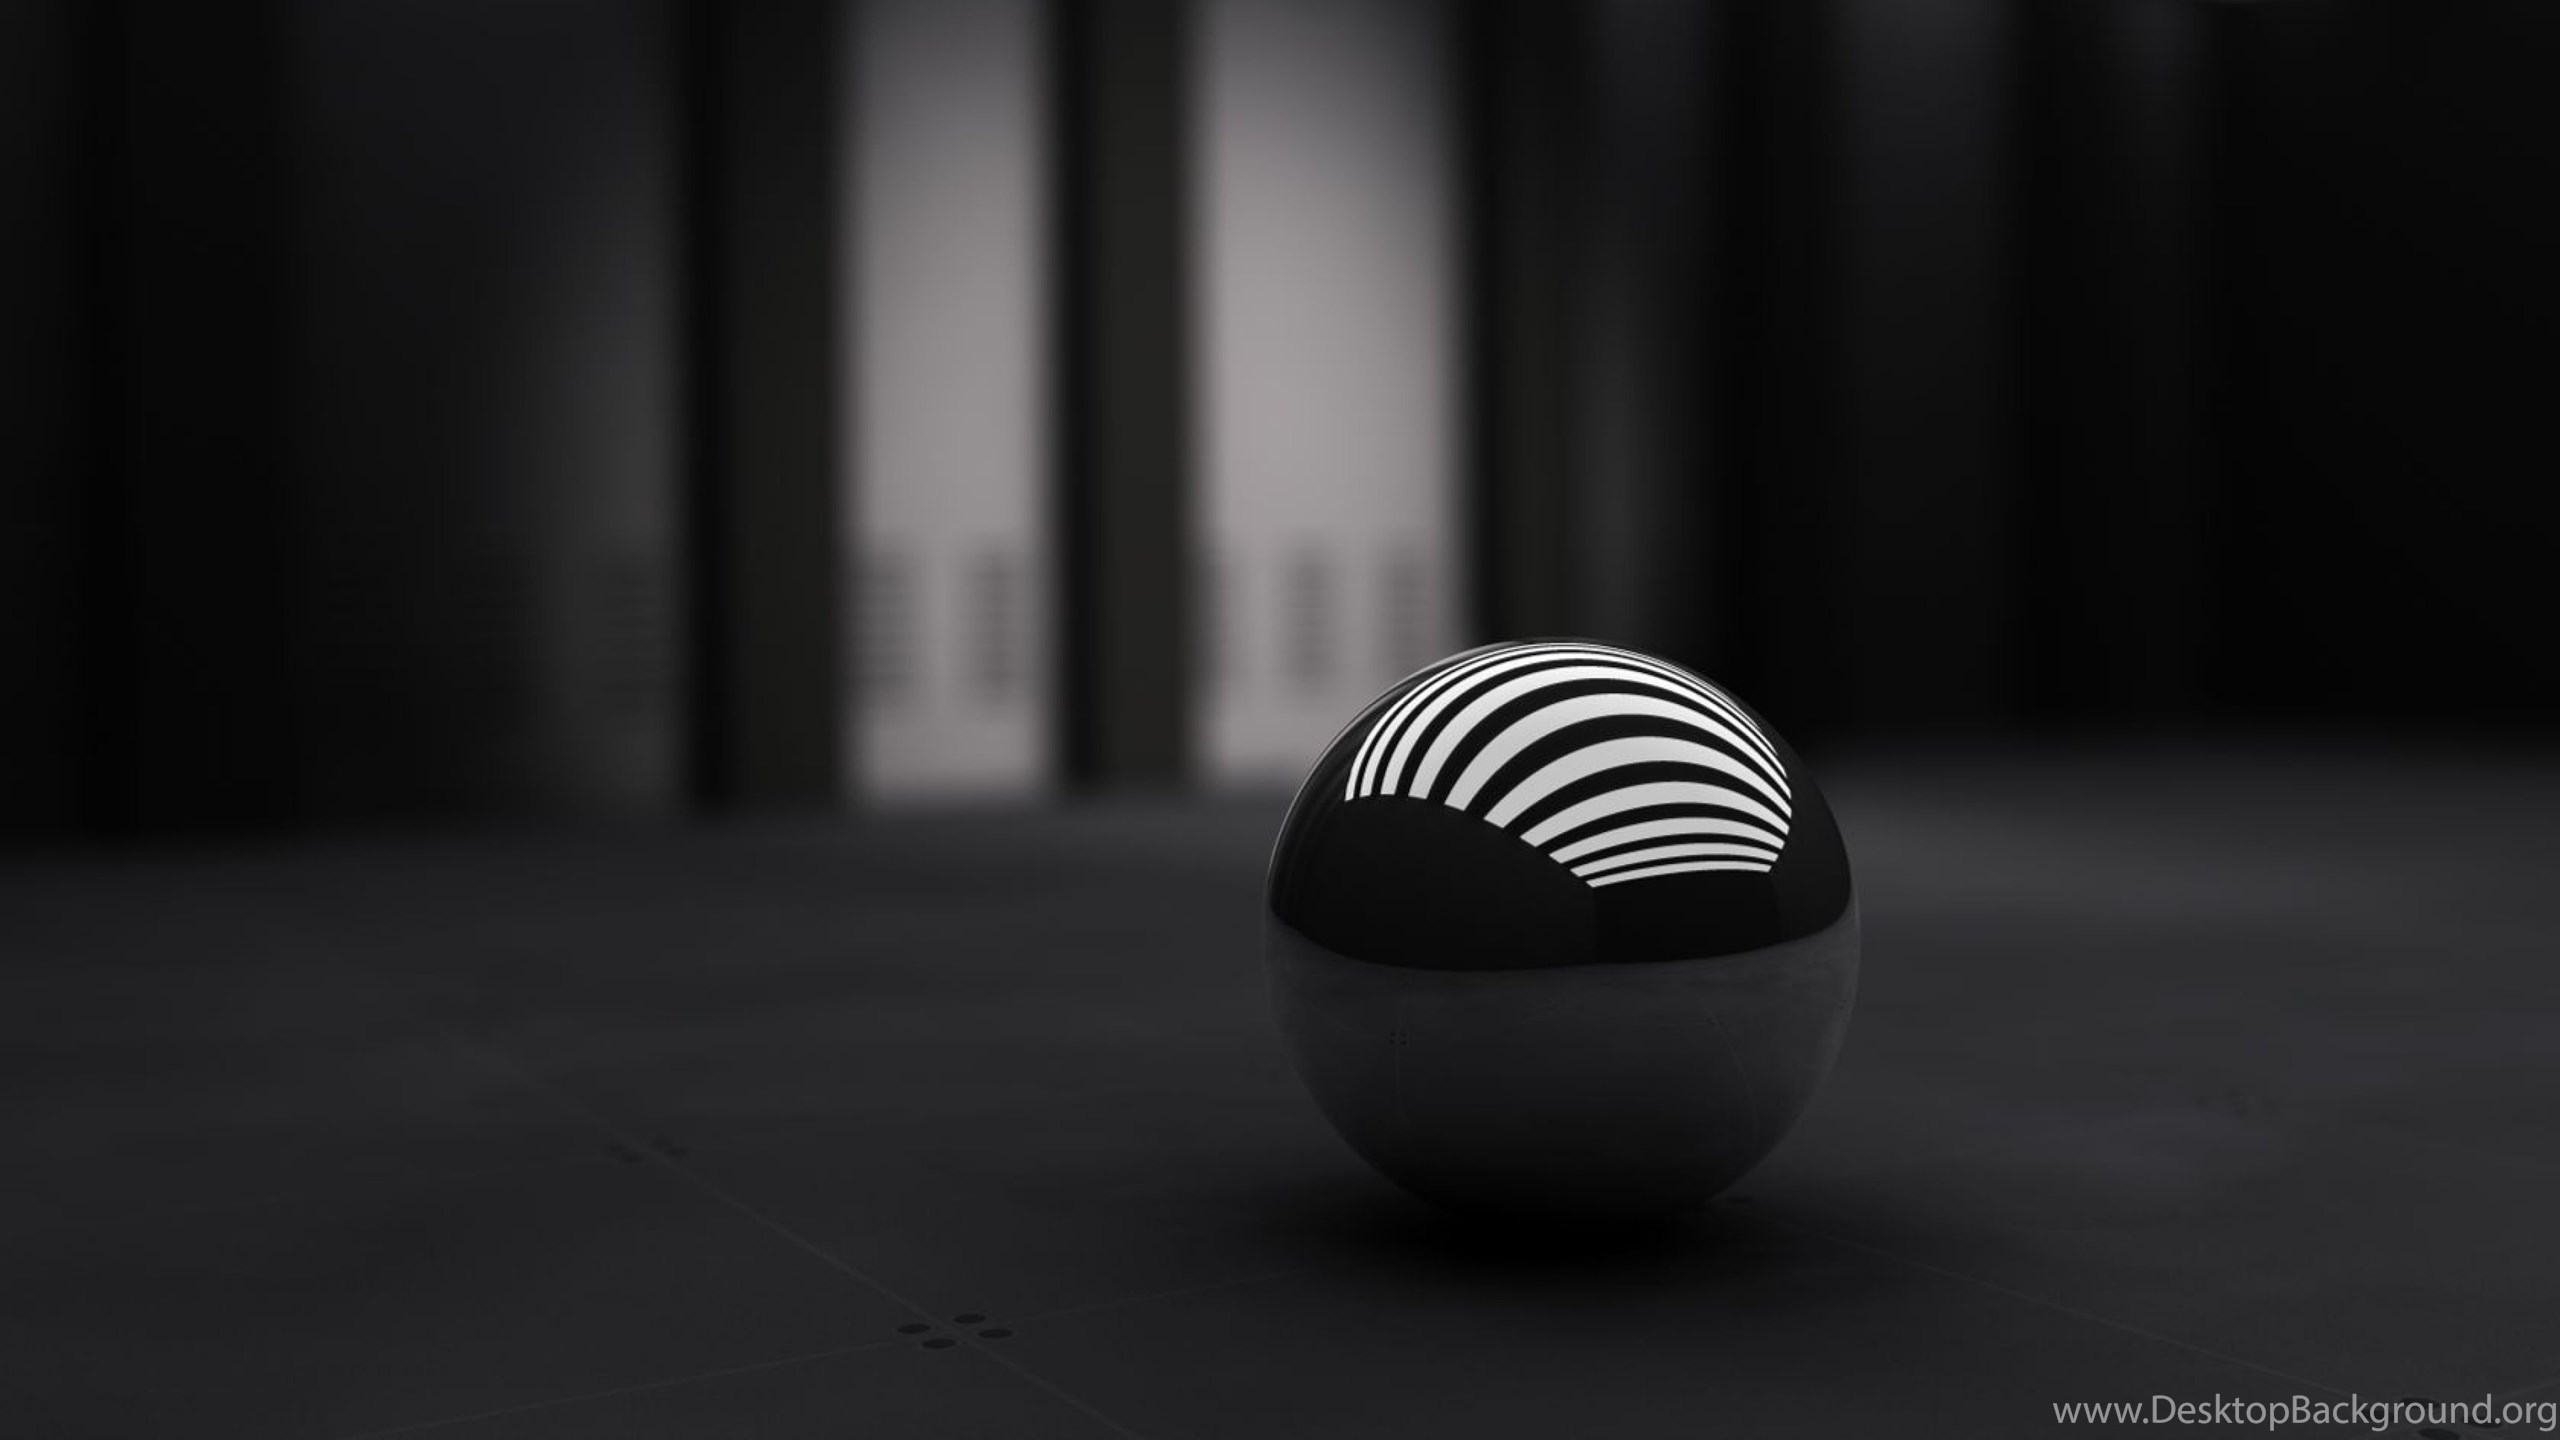 4k Ultra Hd Black Wallpapers Hd Desktop Backgrounds 3840x2160 Desktop Background